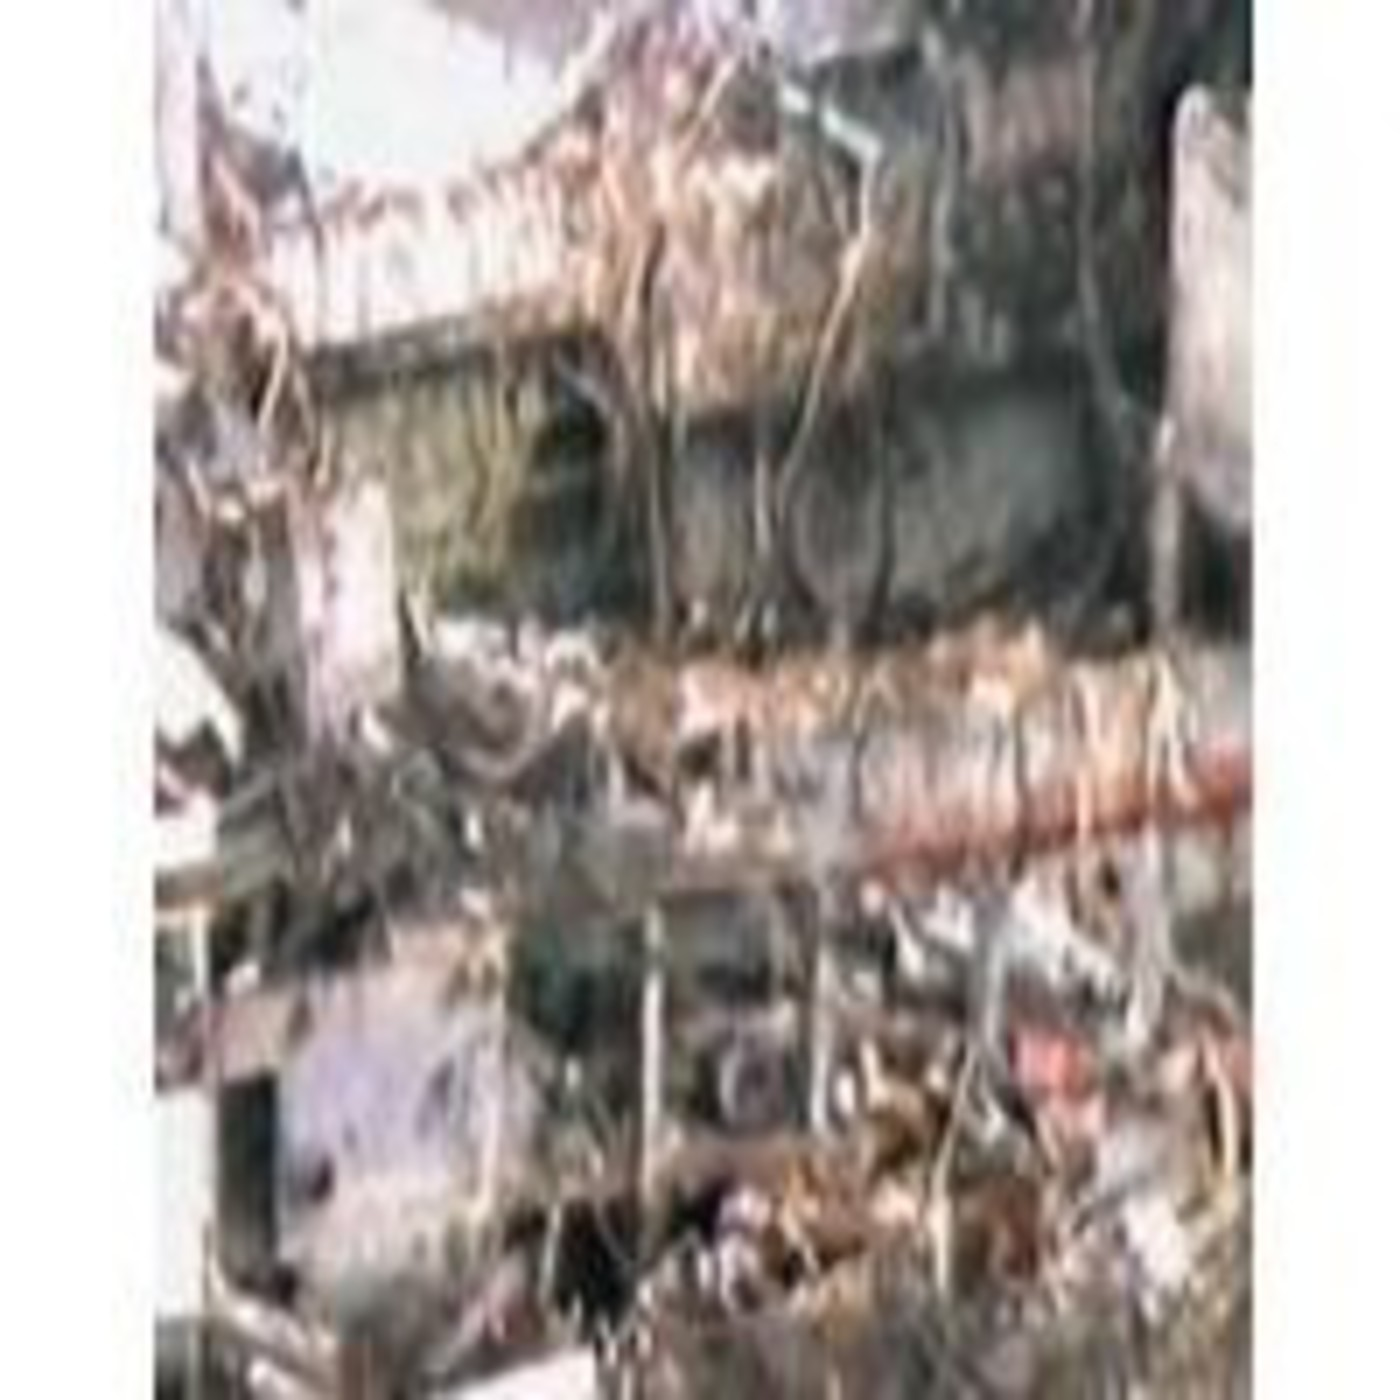 La batalla de Chernóbil (La Noche Temática) - 1/2